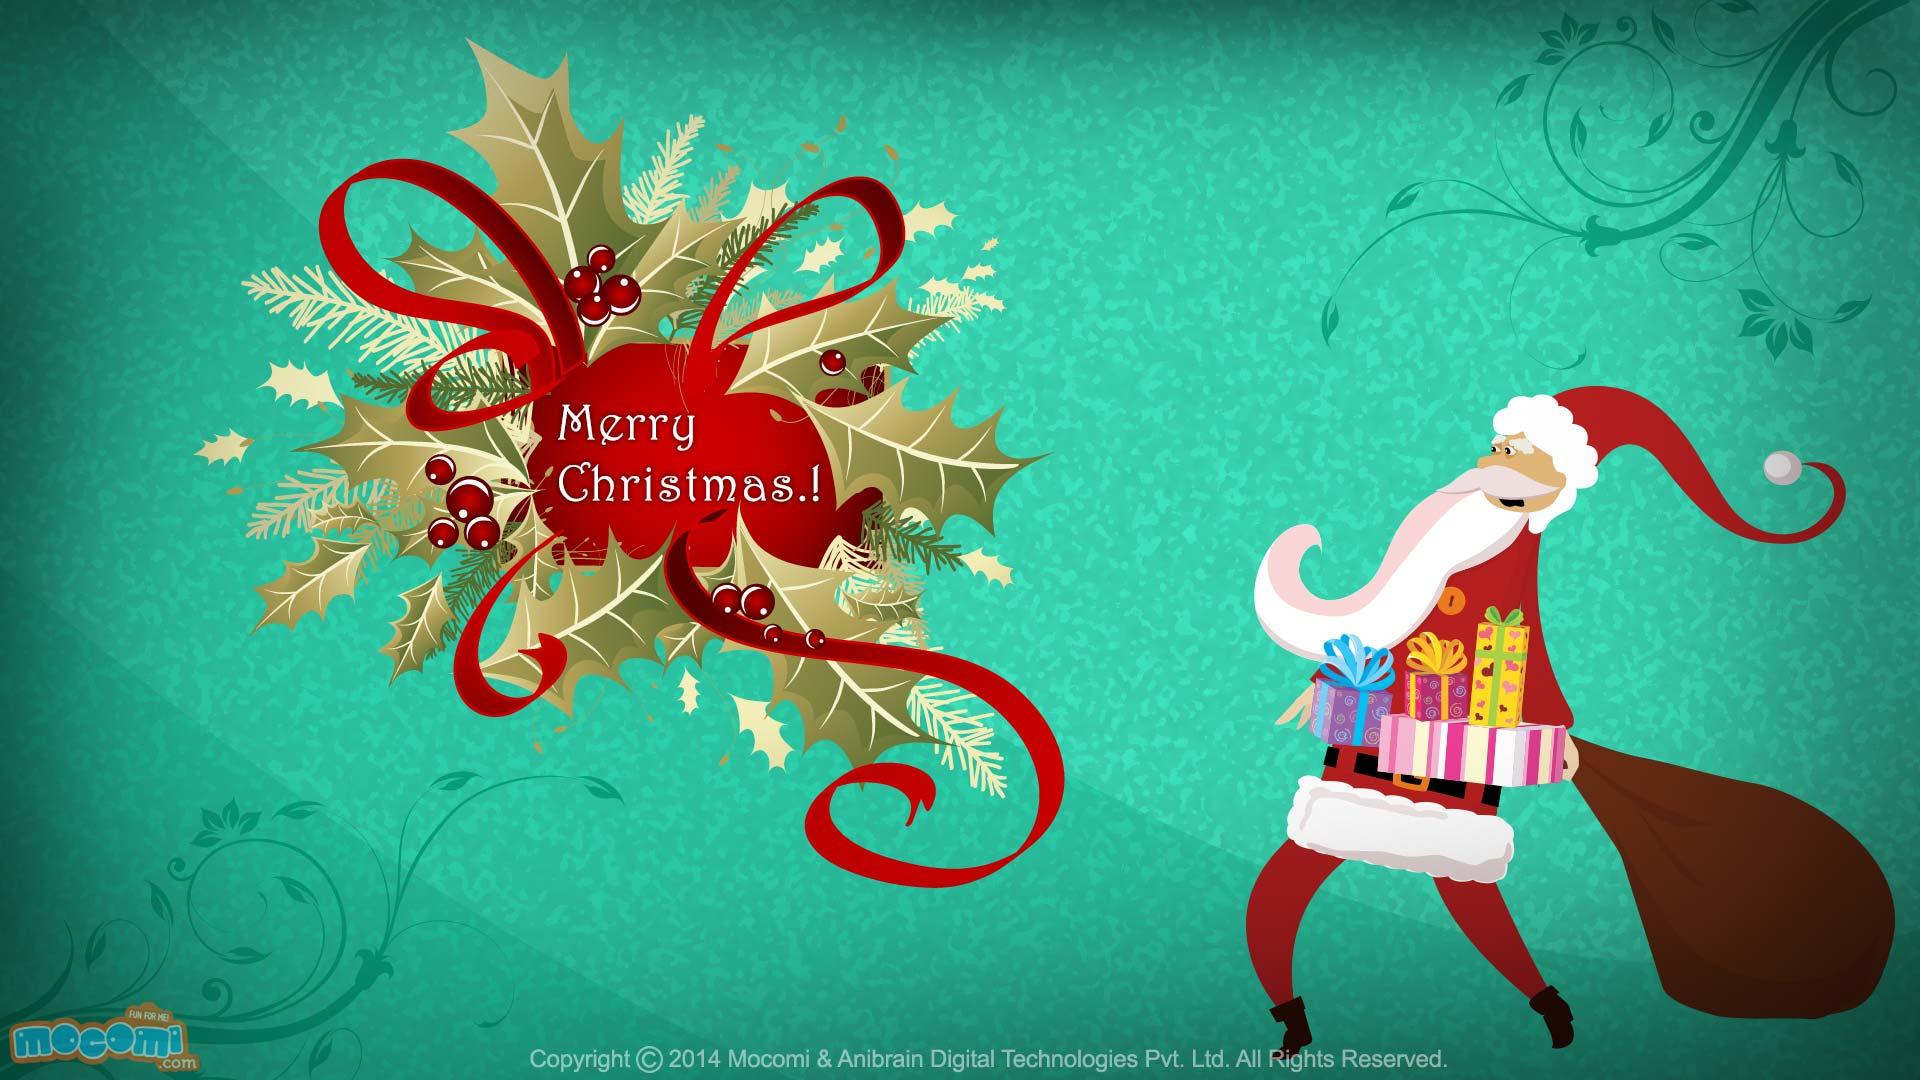 Merry Christmas- Santa